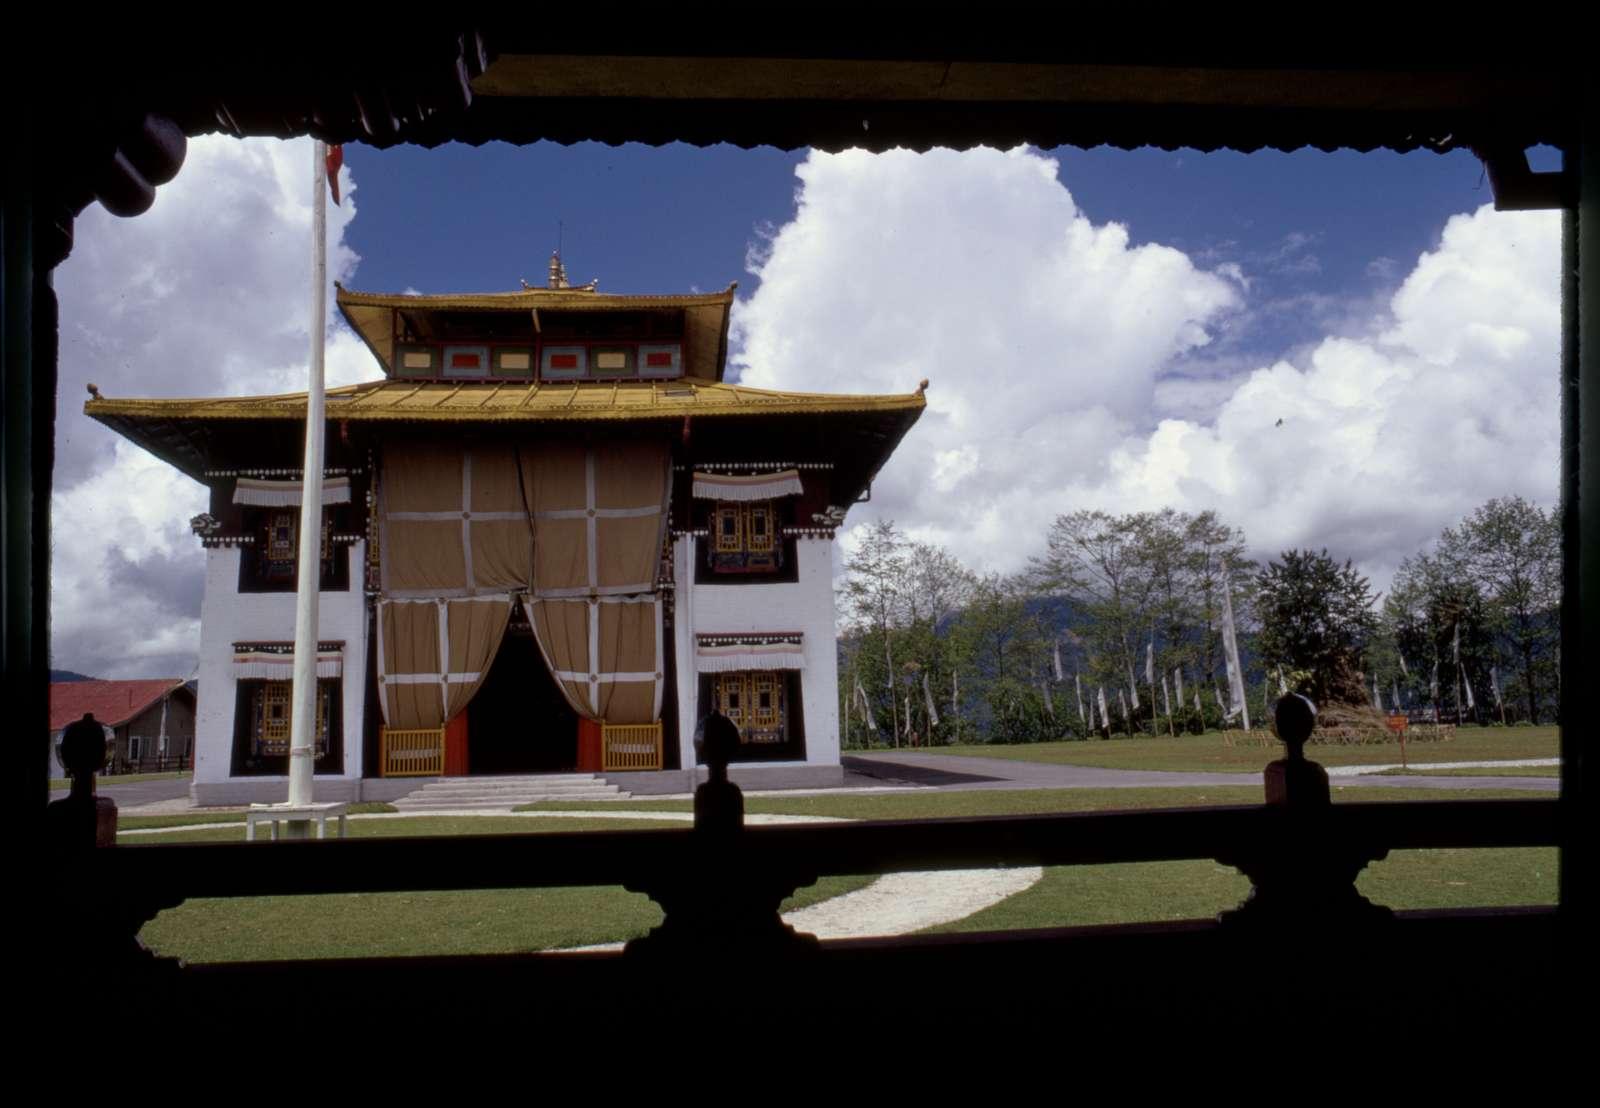 [Tsuklakhang Main Temple (Palace Temple), Gangtok, Sikkim]